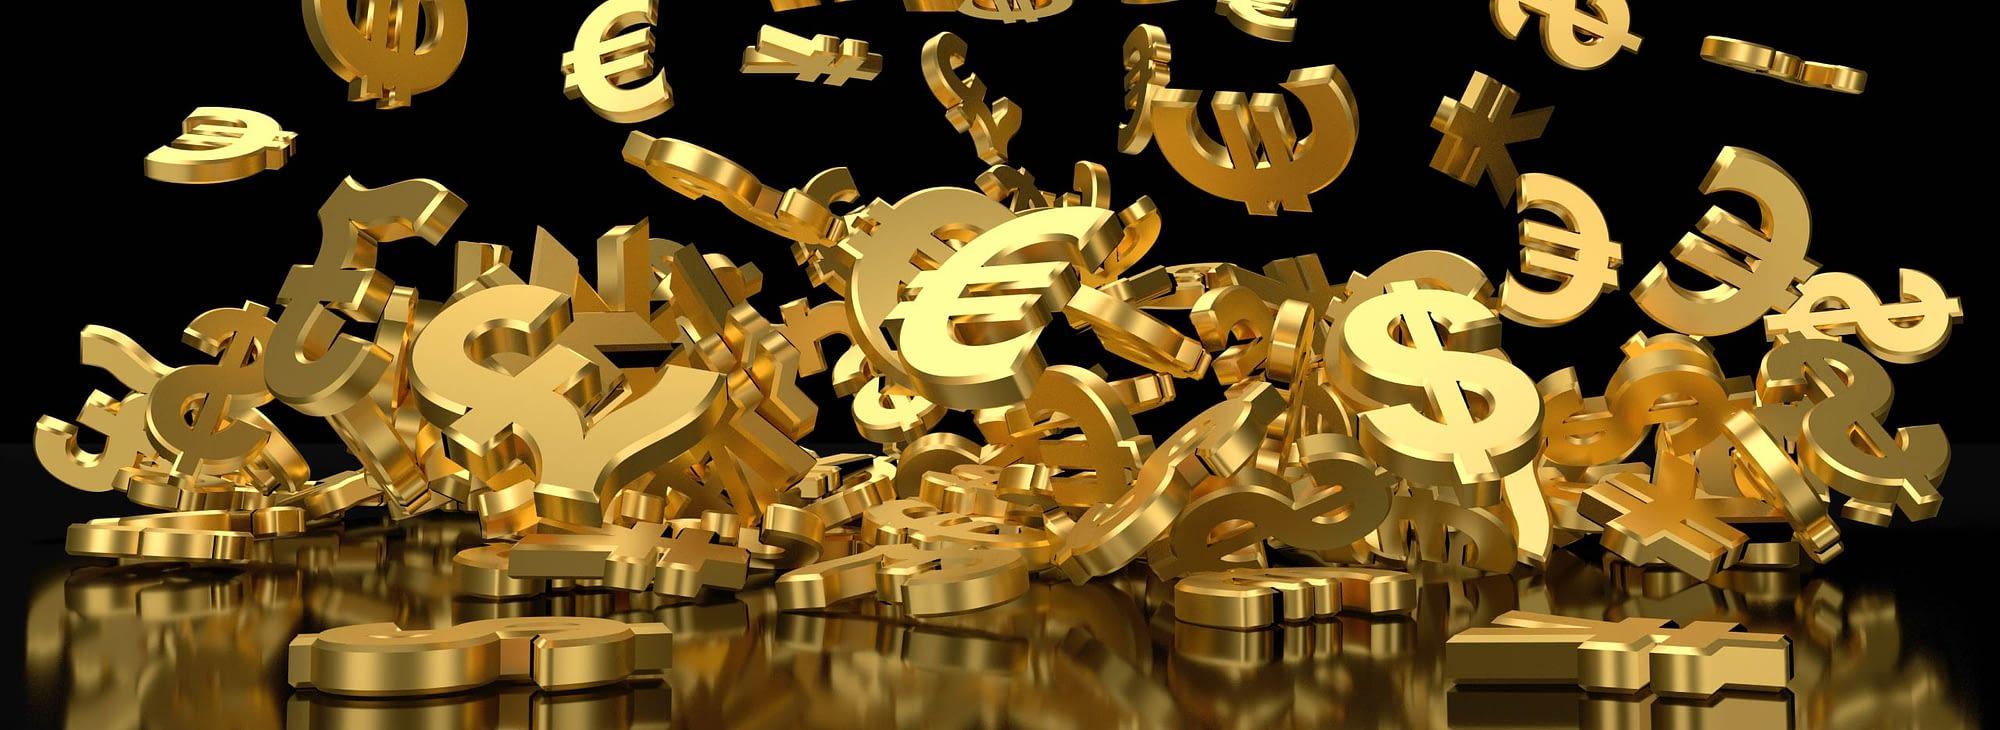 3D padajuće oznake valuta – ilustracija